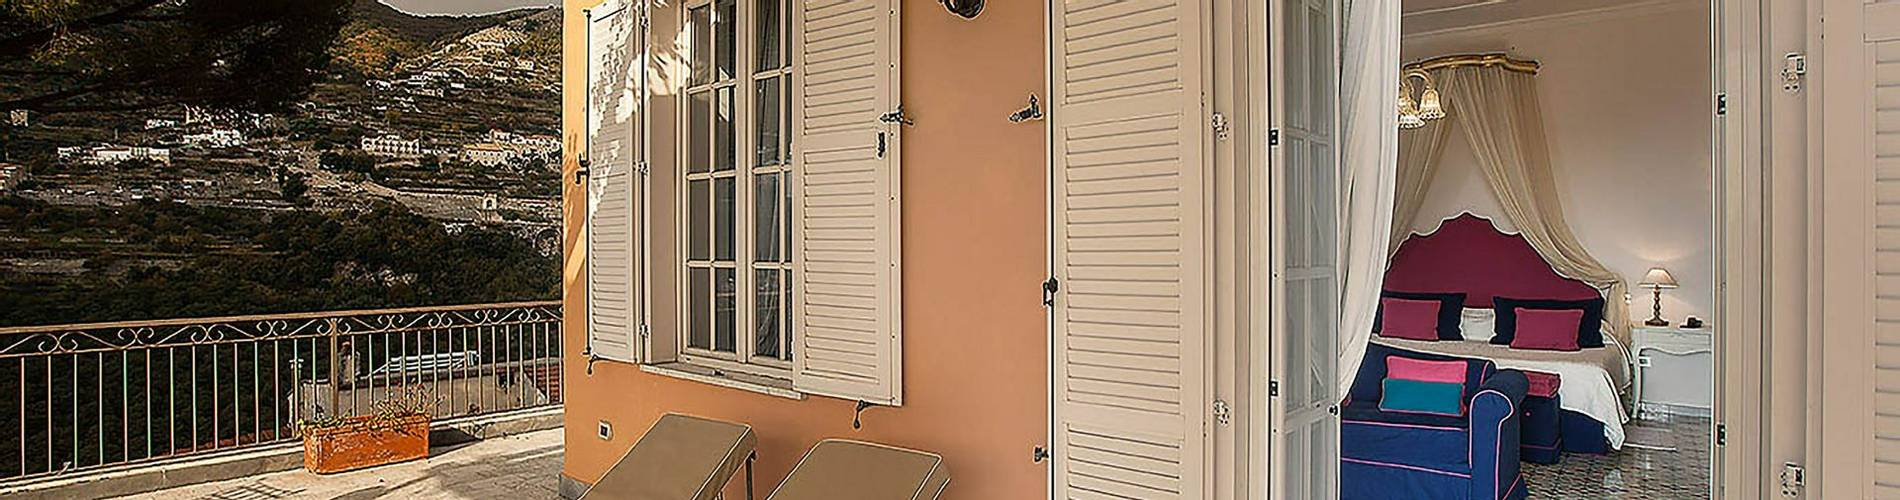 Villa Maria, Amalfi Coast, Italy, suite-from-terrace.jpg